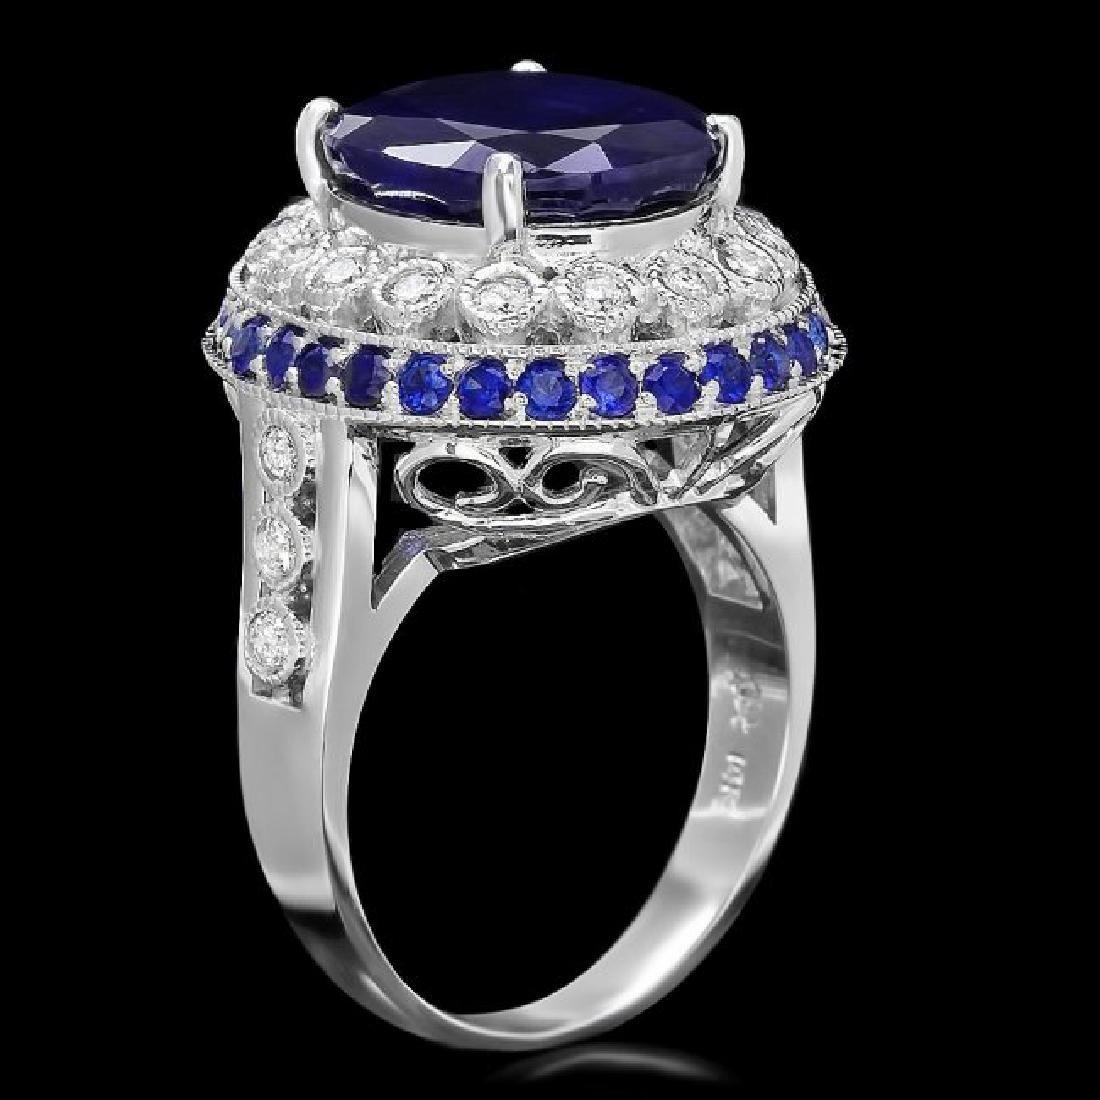 14k Gold 9.35ct Sapphire 0.55ct Diamond Ring - 2